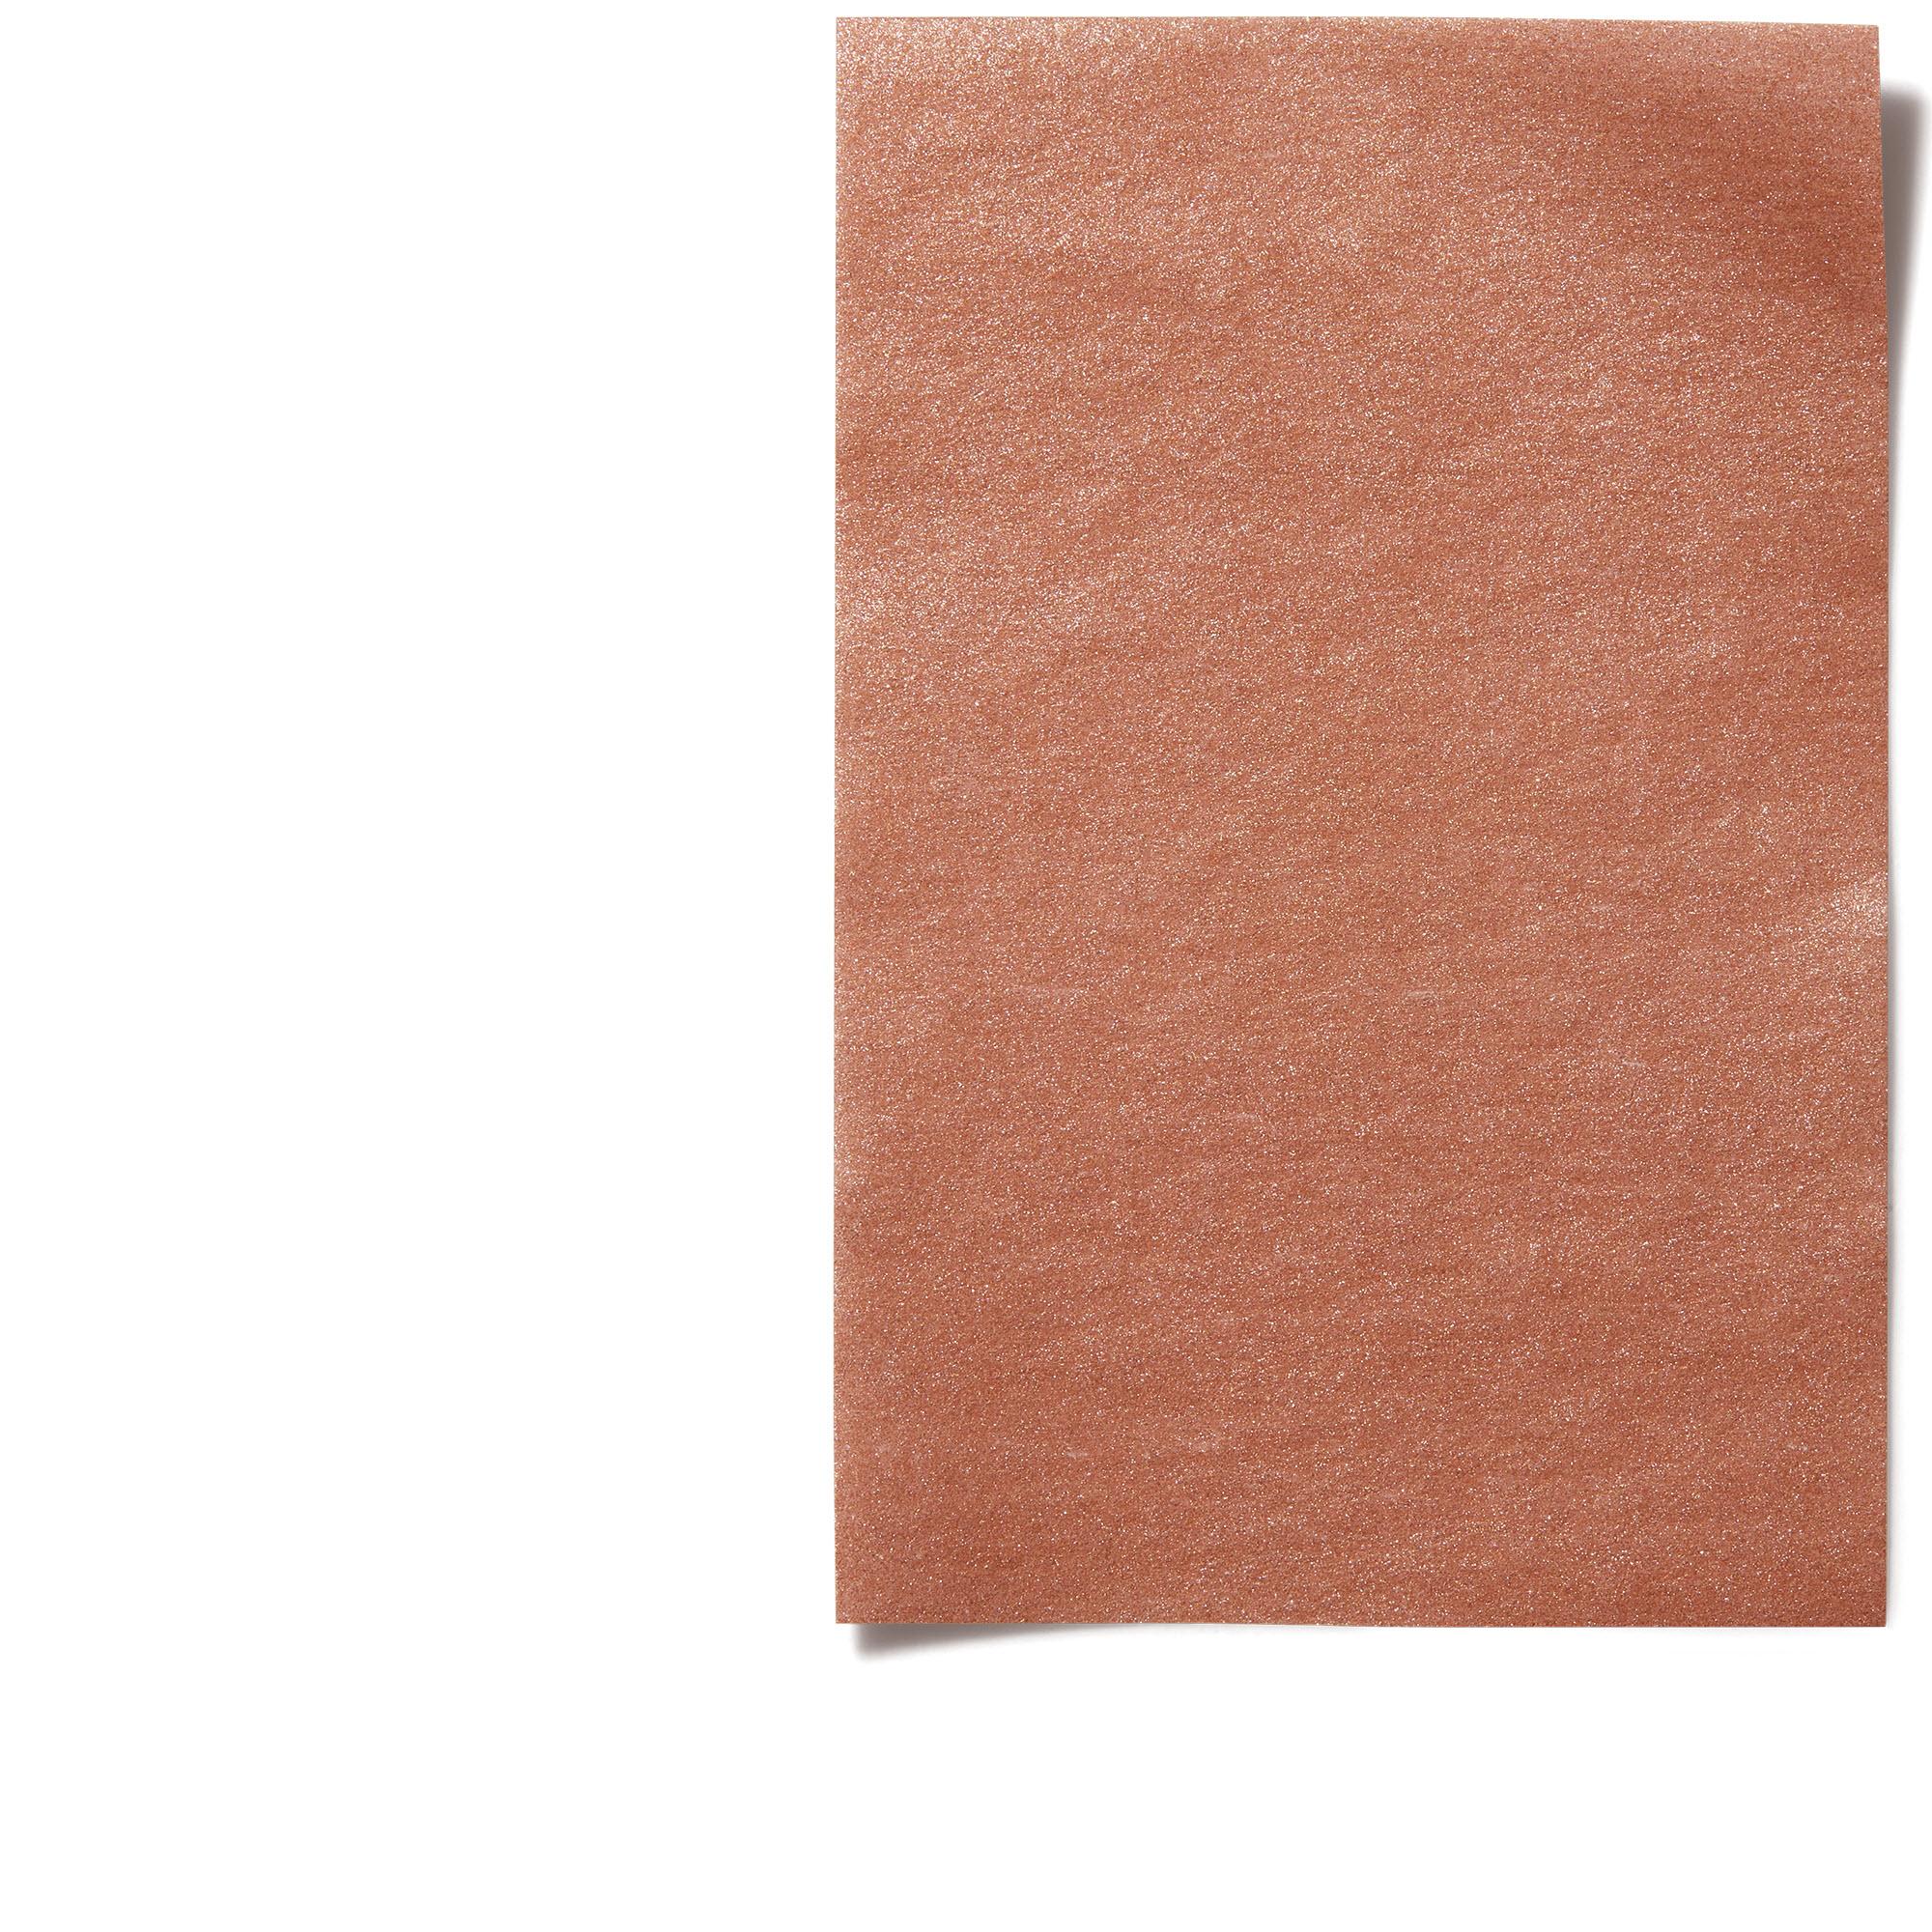 Makeup Sheets